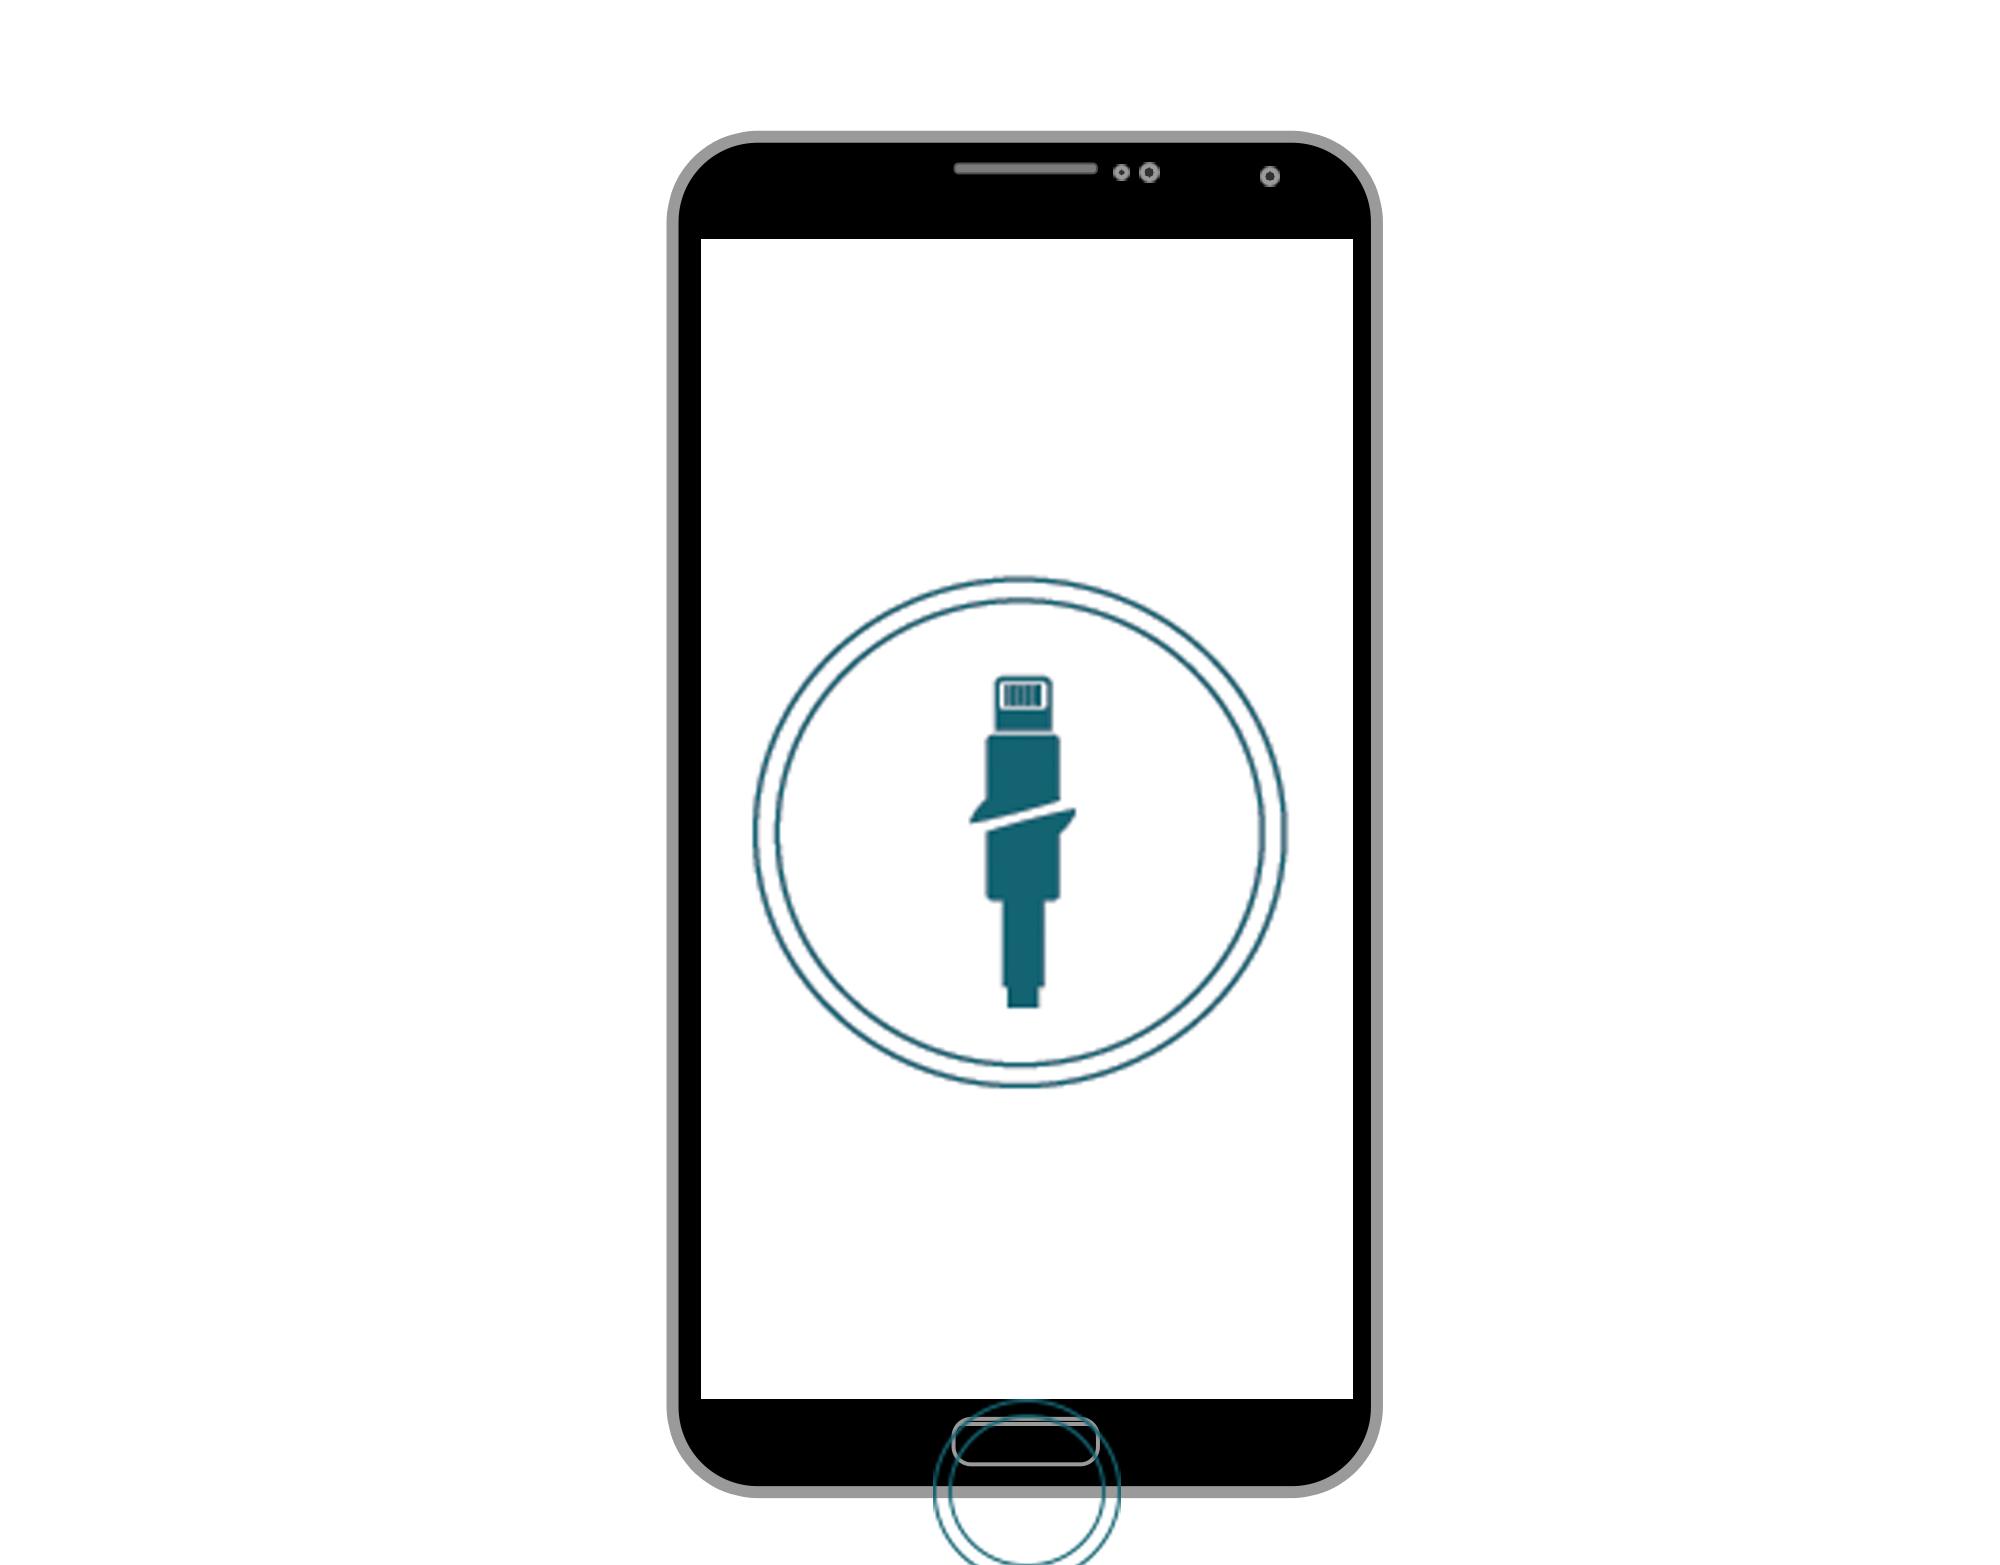 Samsung Galaxy S3 Antenna Port